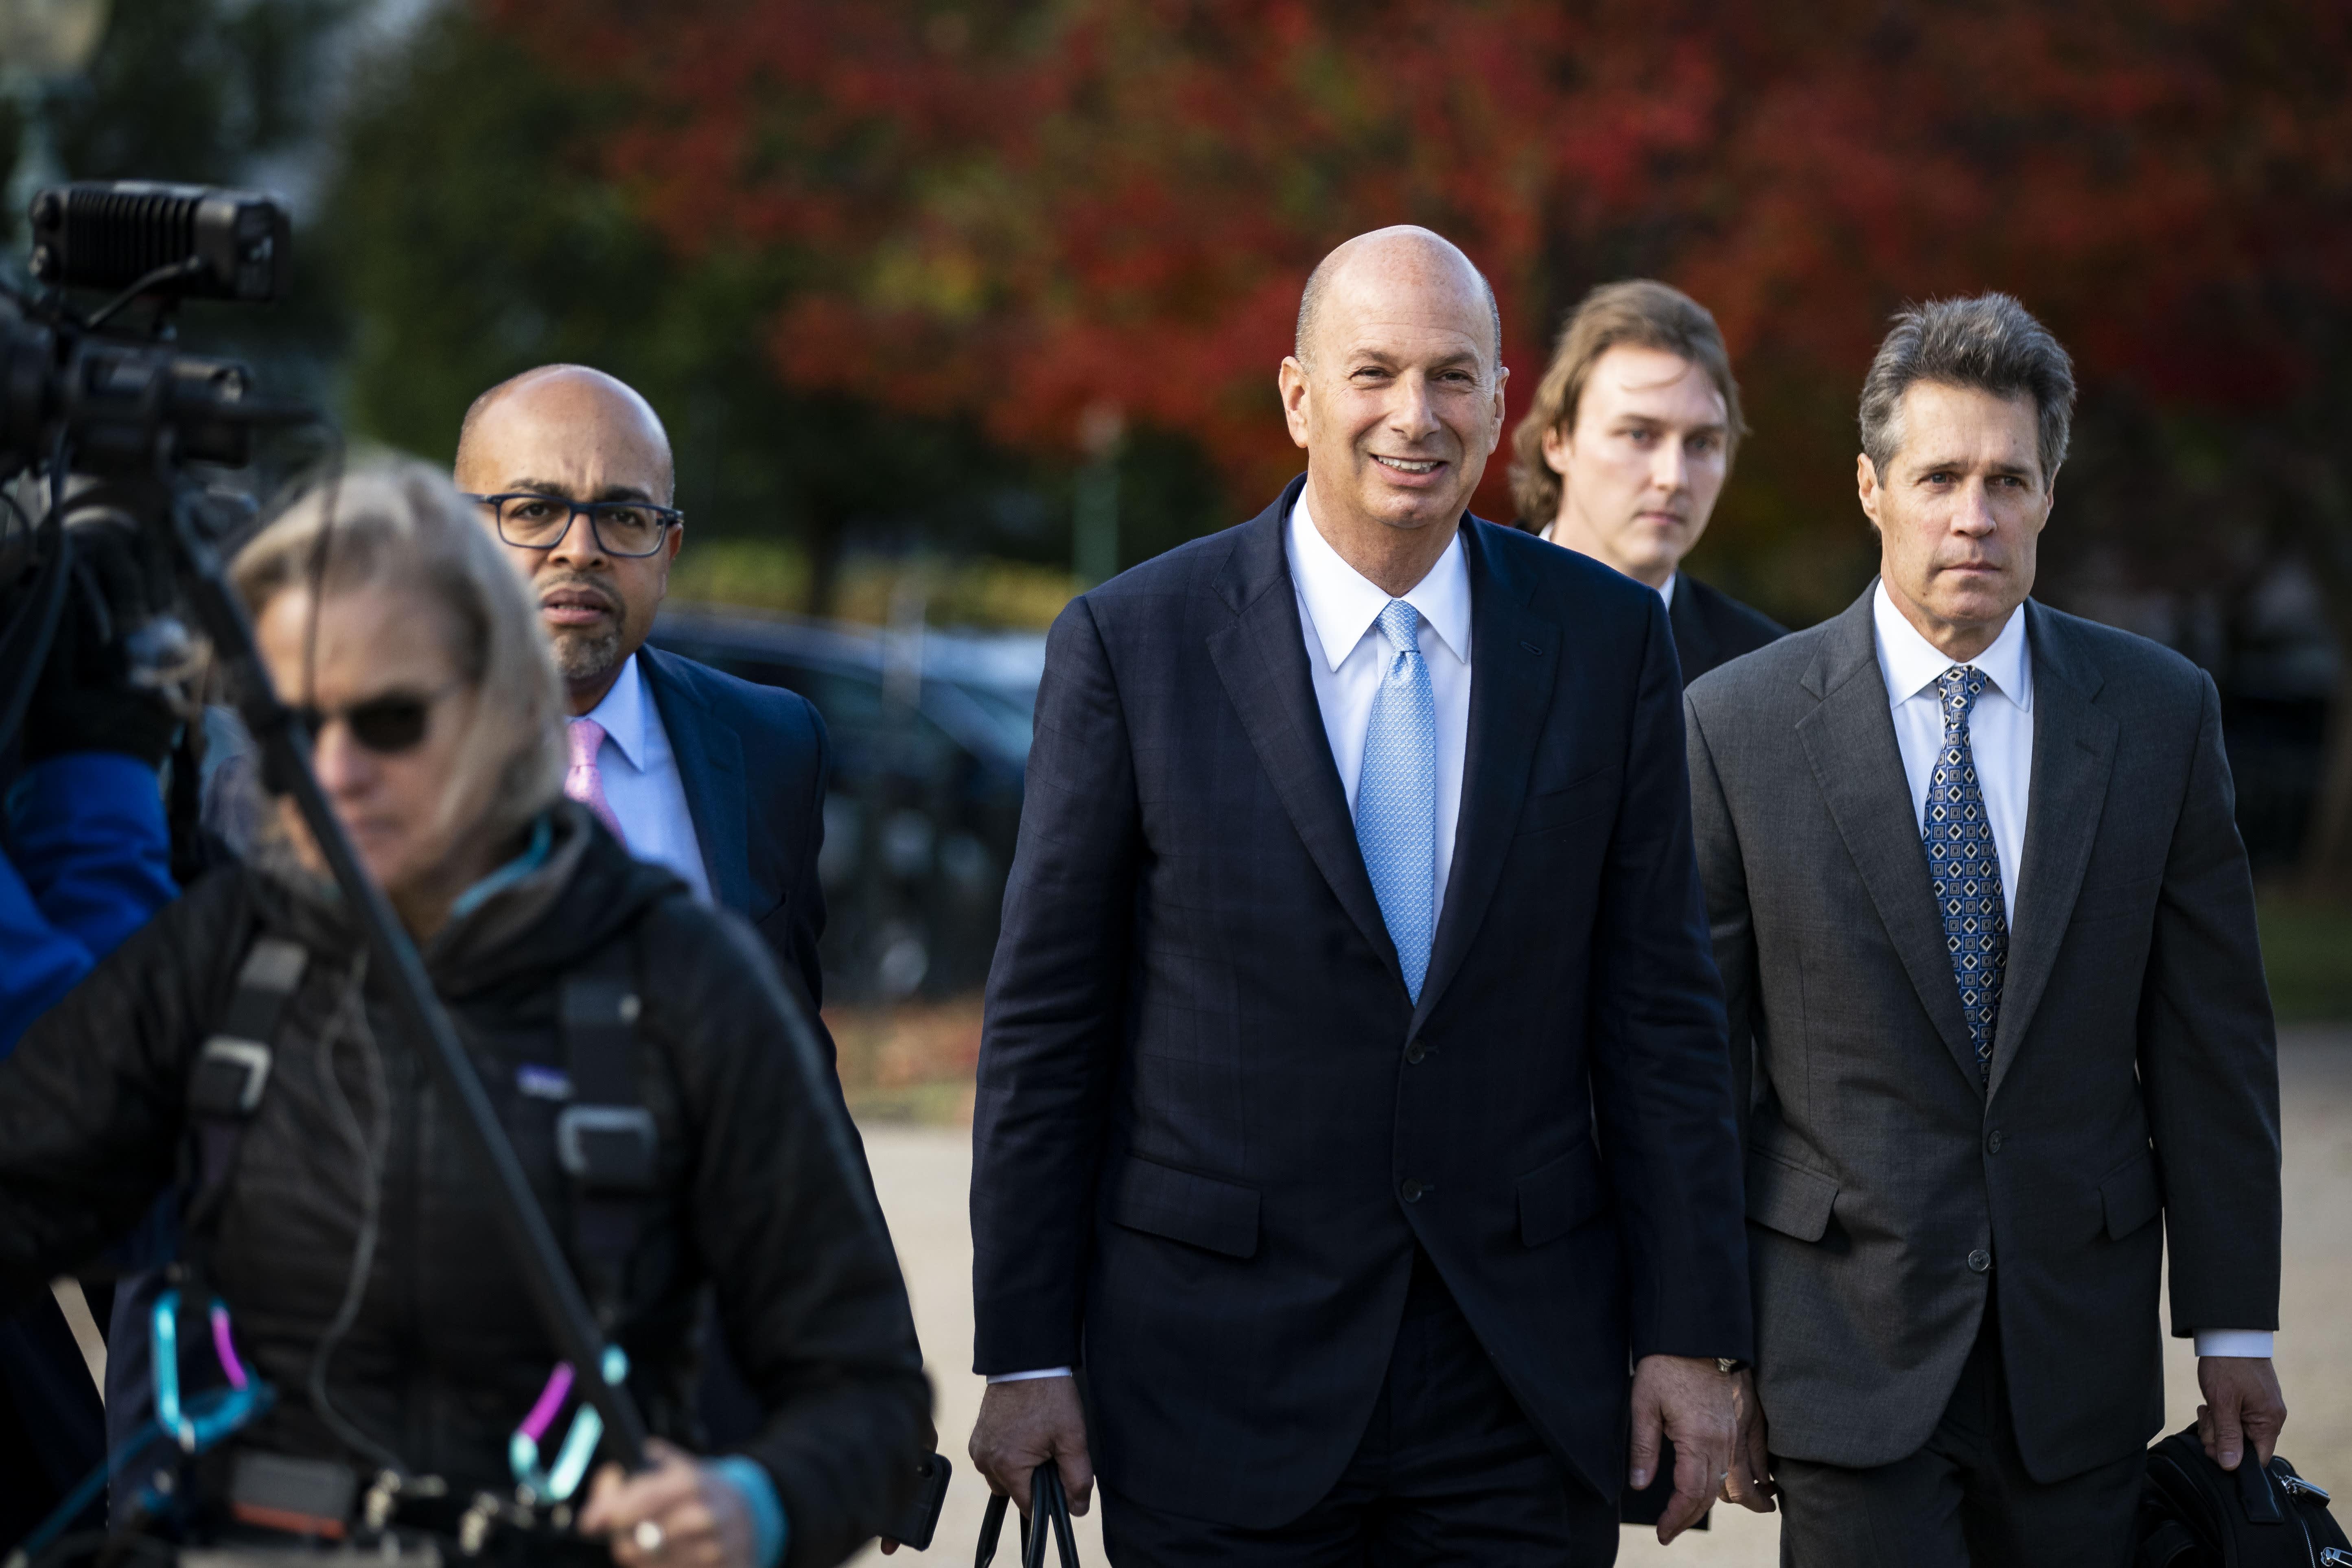 Trump ordered Ukraine 'quid pro quo' through Giuliani, key witness Sondland testifies